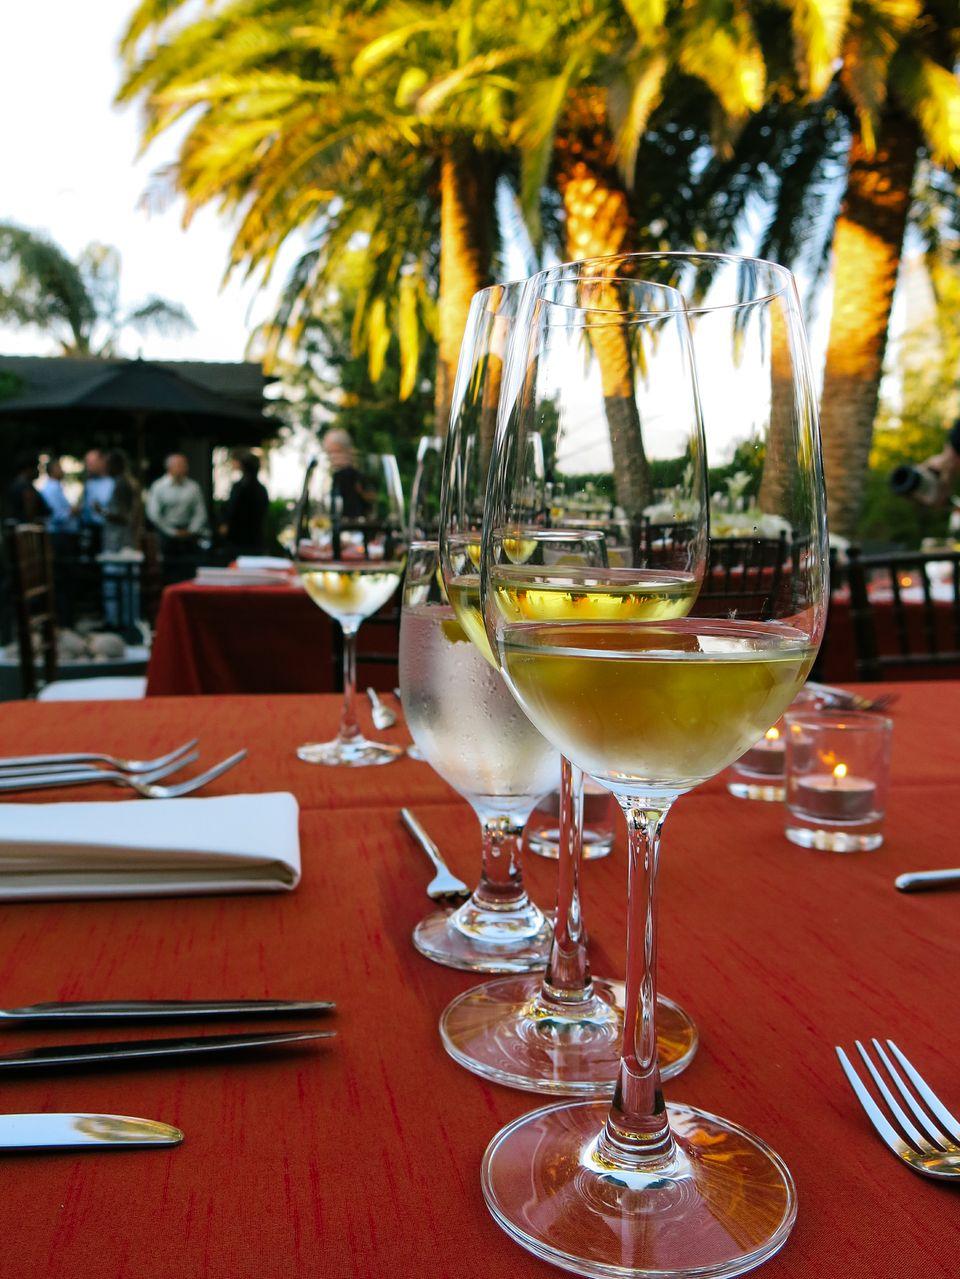 Hire Wine Expert in LA In Home Tasting